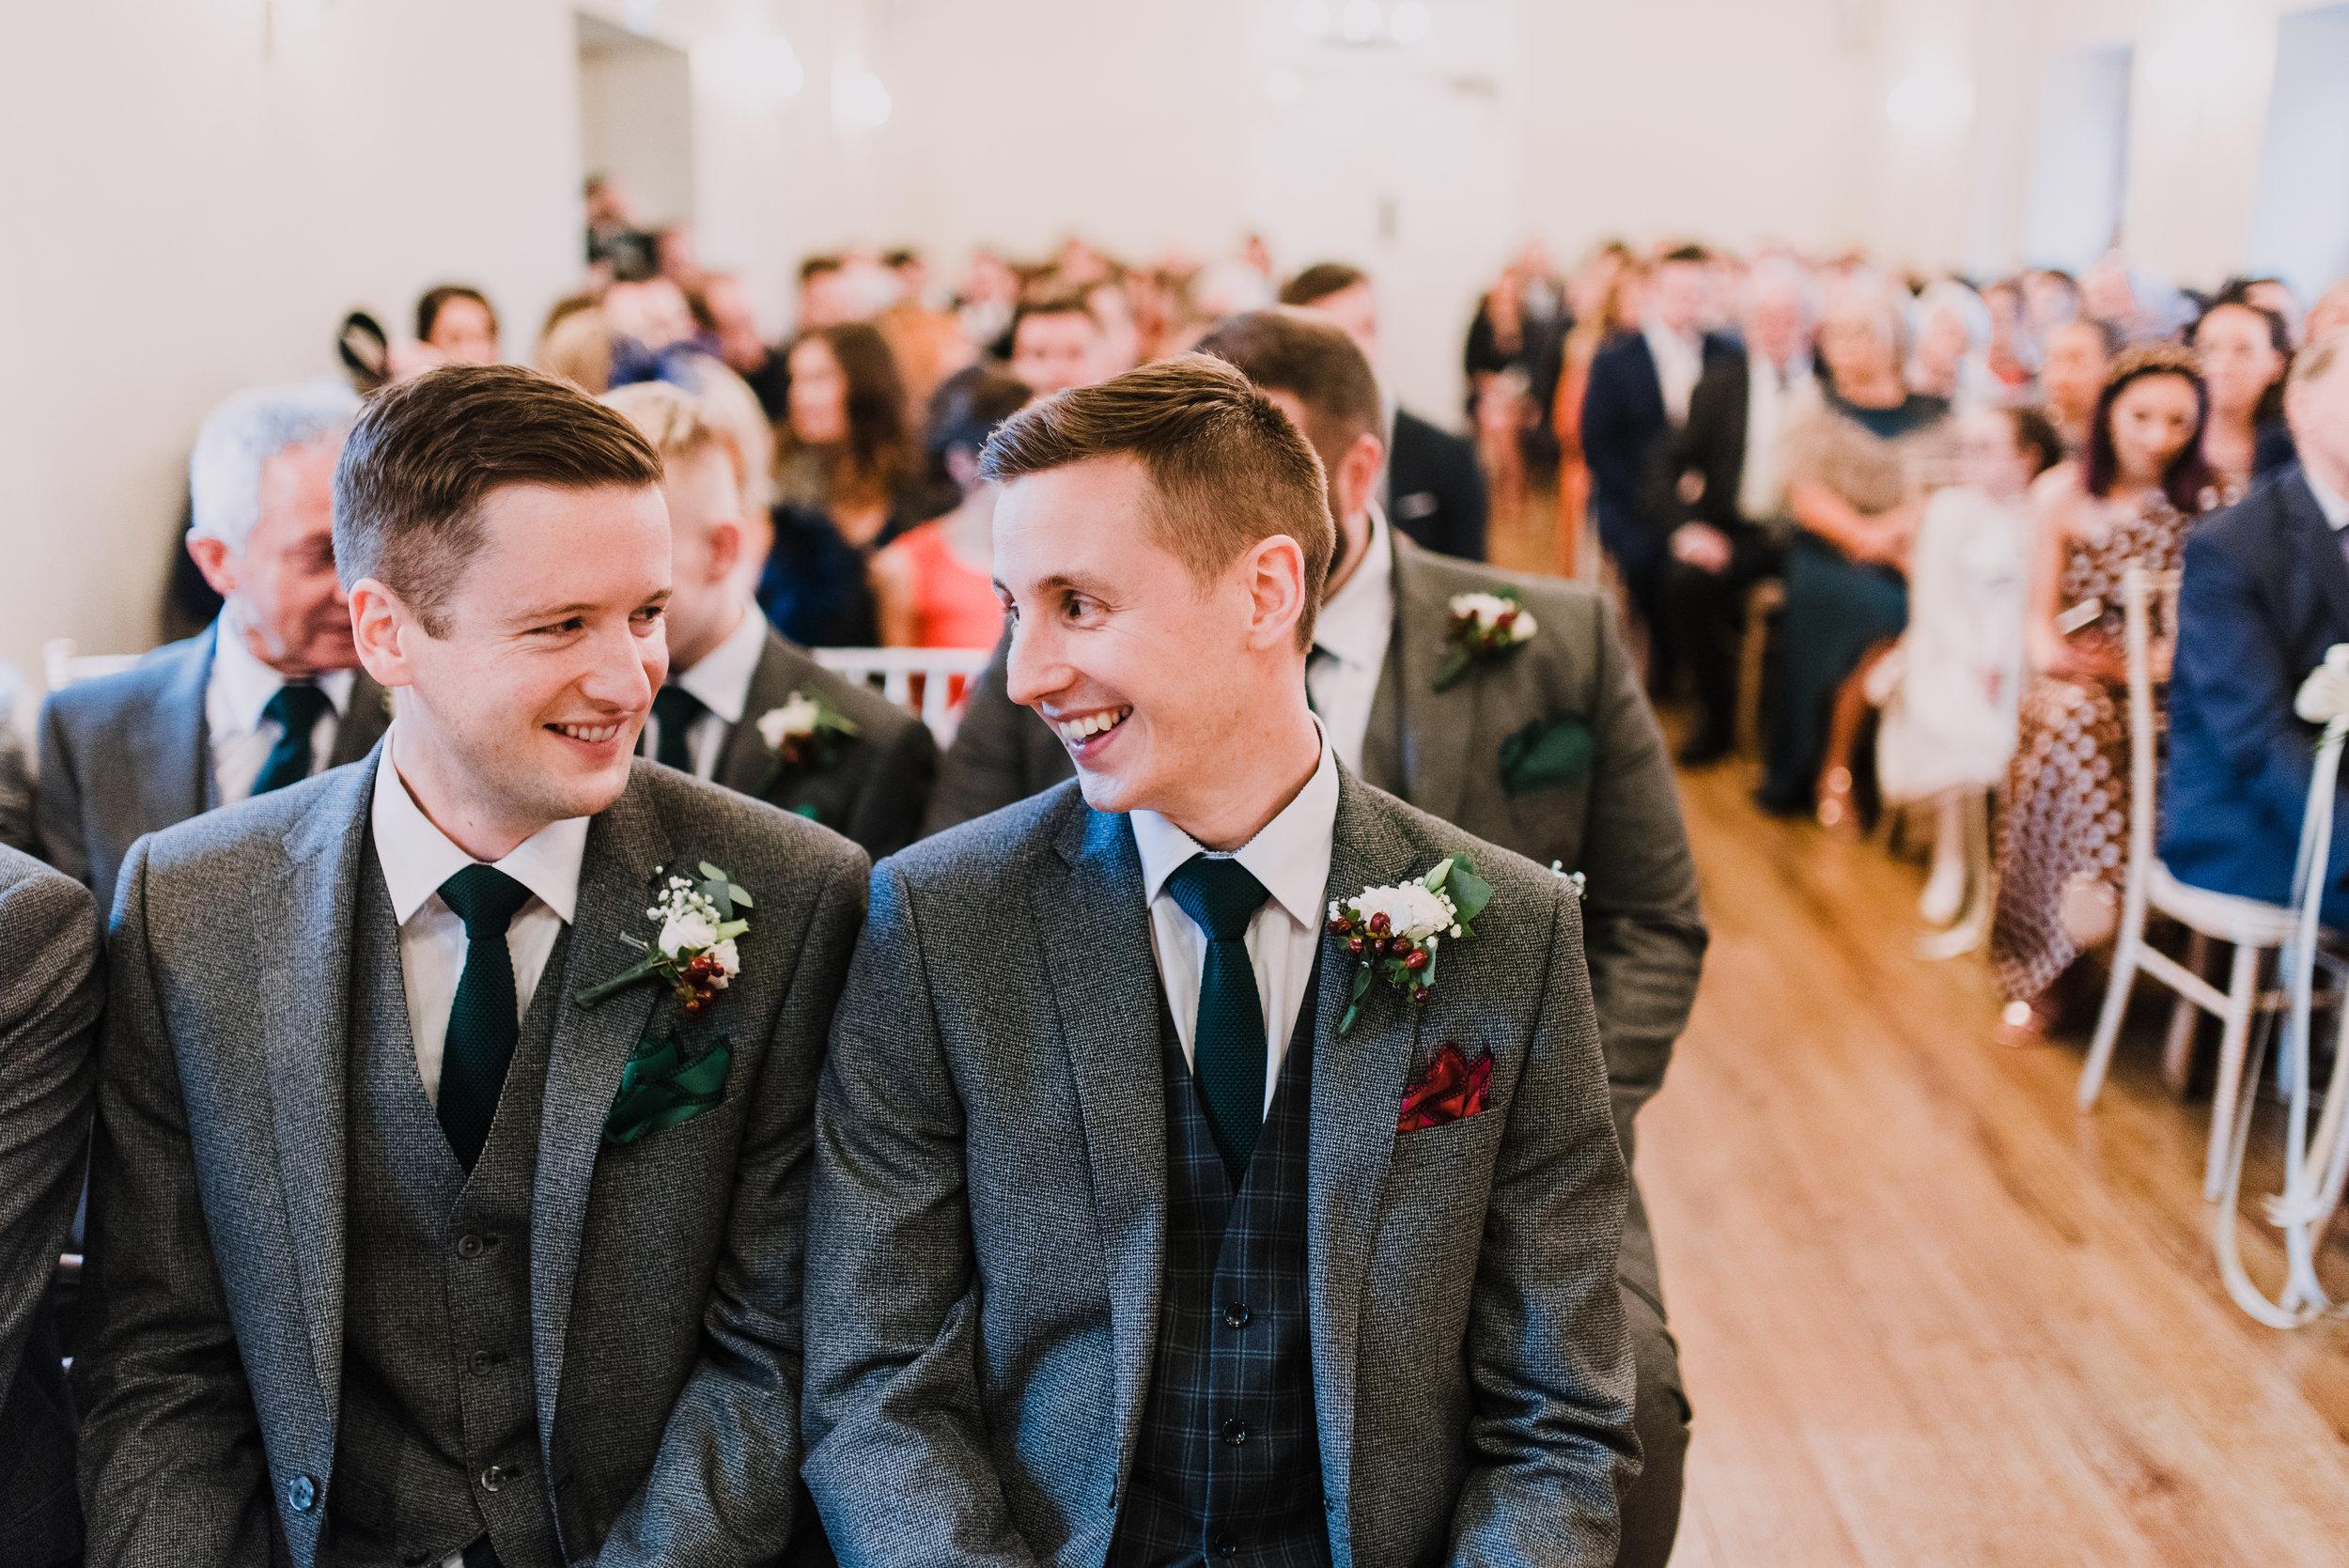 larchfield estate wedding, wedding venues northern ireland, barn wedding venues northern ireland, quirky weddings northern ireland, 5 star wedding venues ni, wedding ceremony larchfield estate (1).jpg